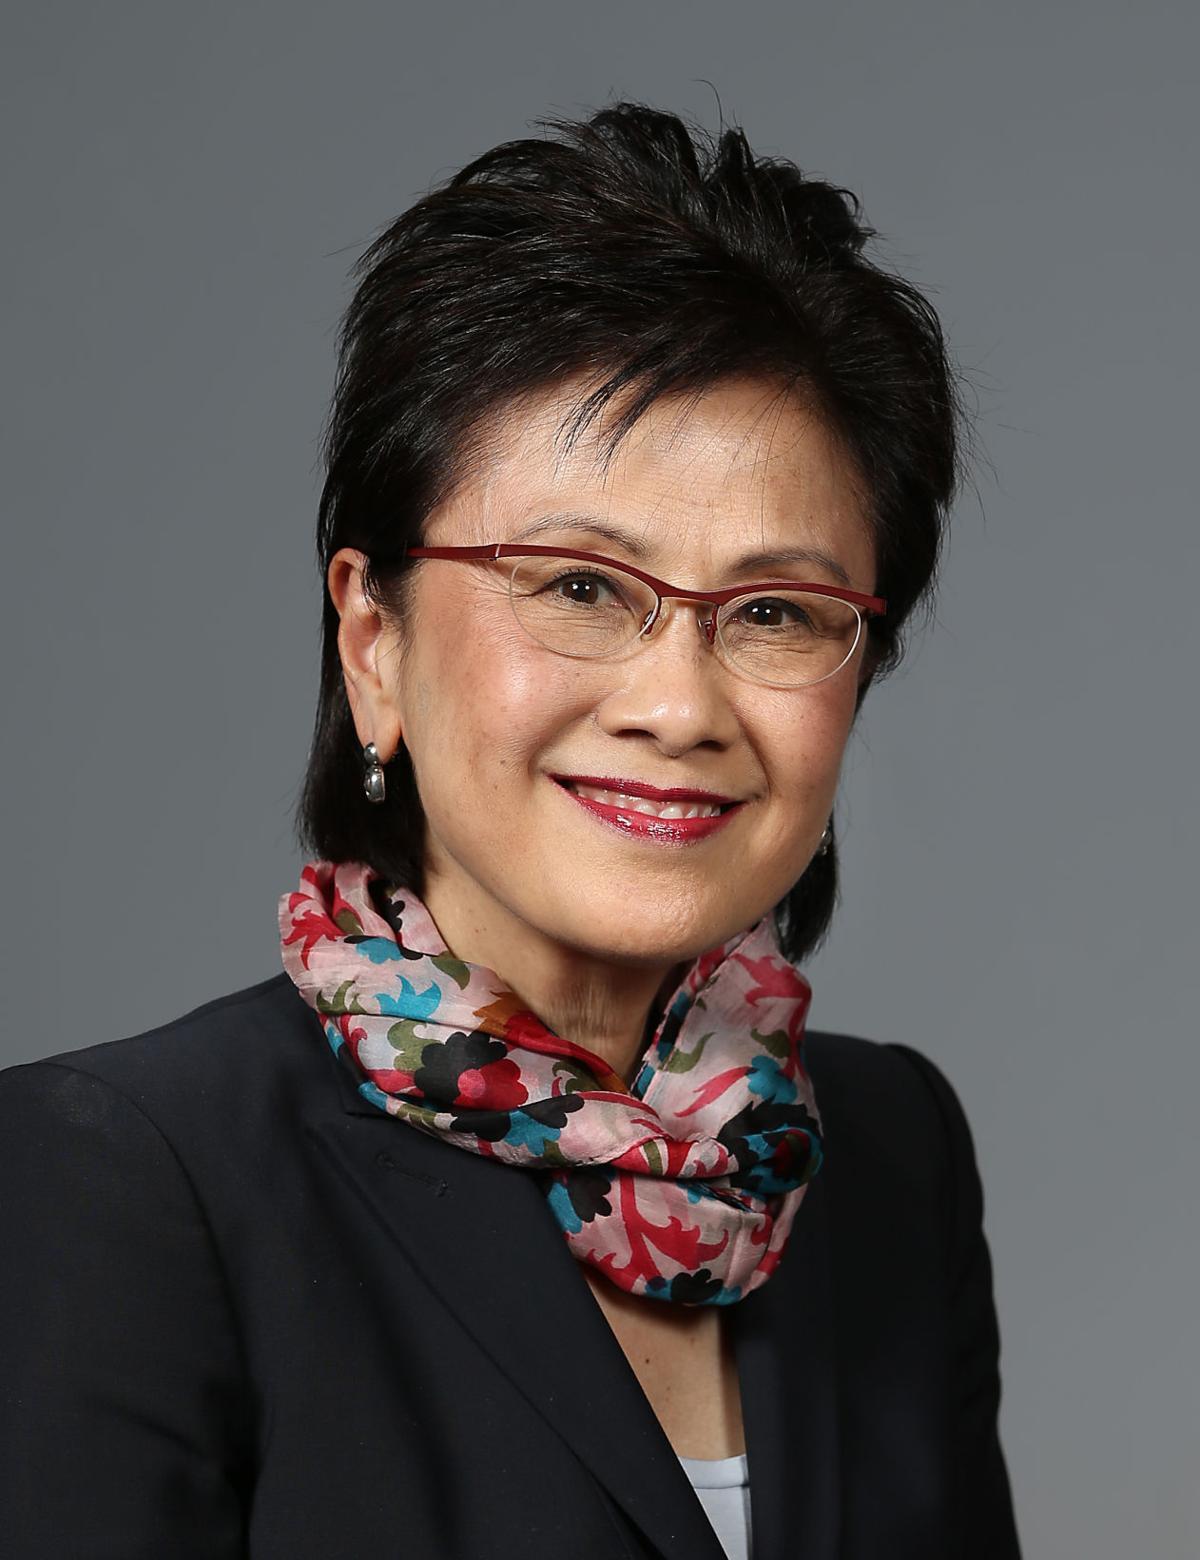 Bakersfield mayoral candidate Karen Goh